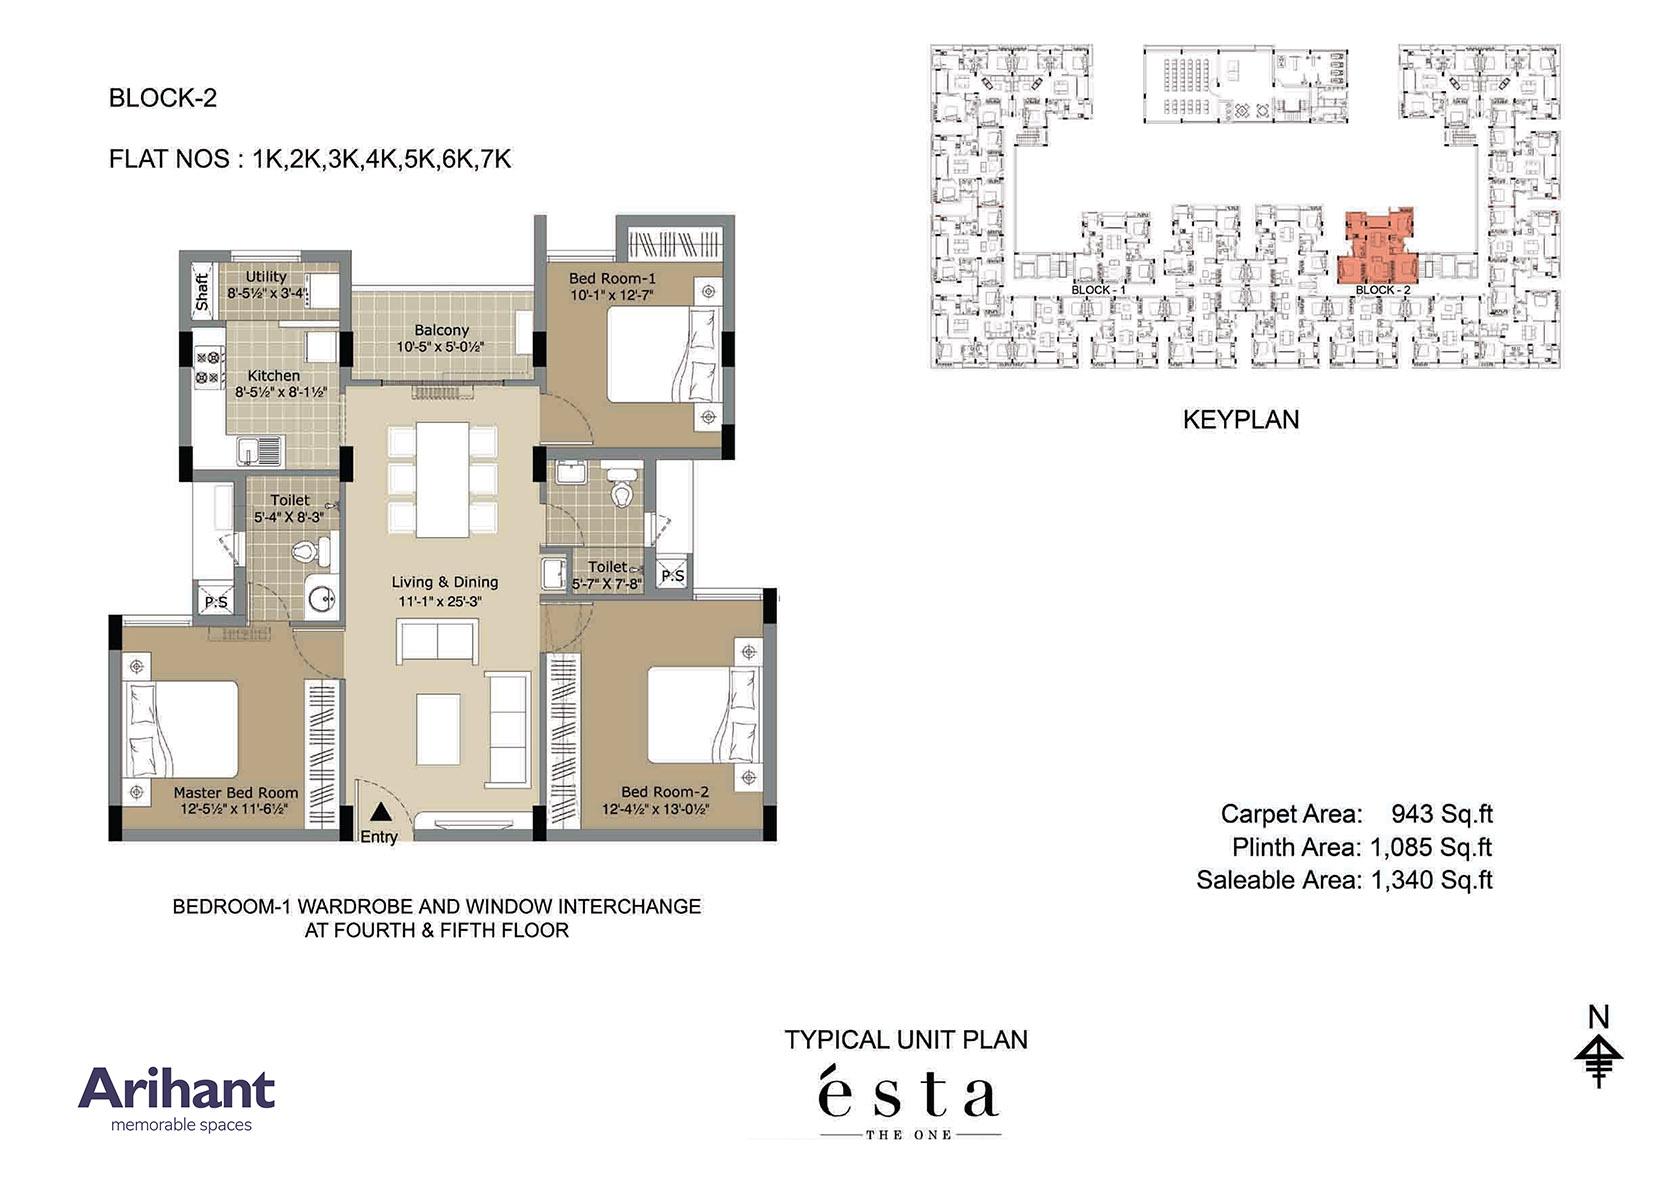 Arihant - Esta_Typical Unit Plan - Block 2 - Type K